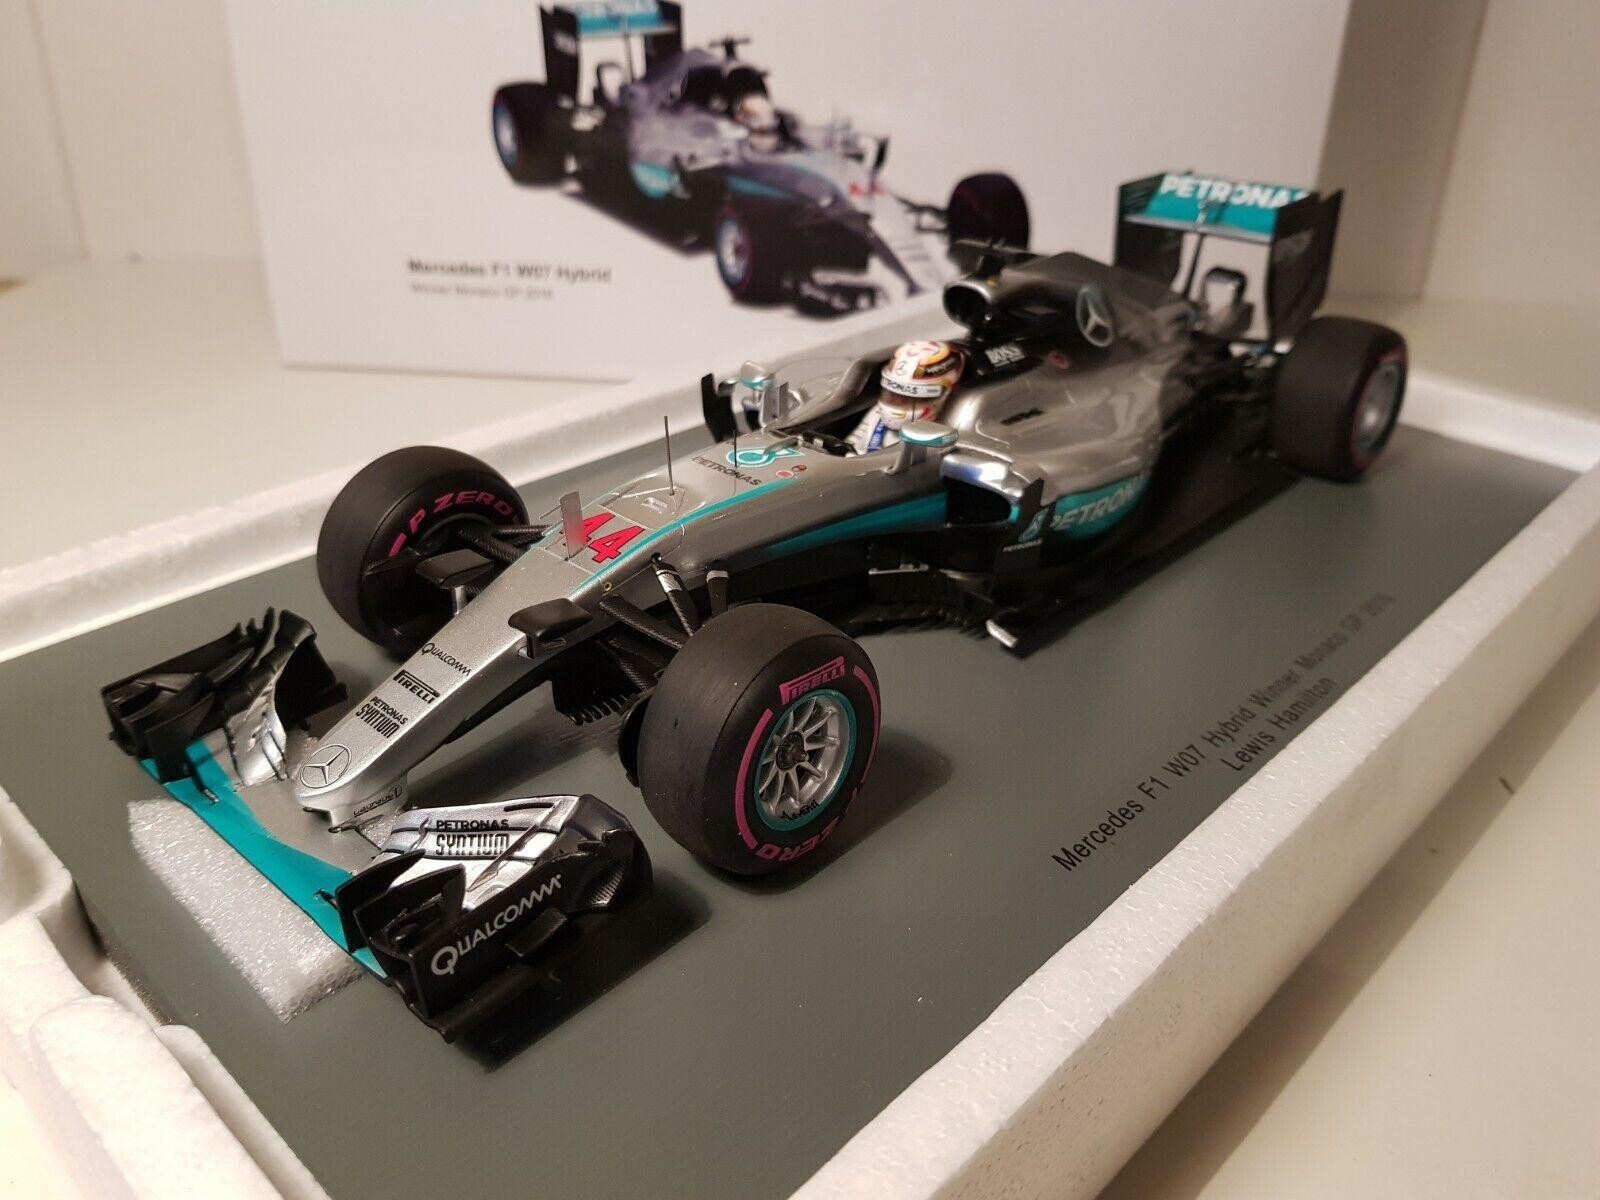 SPARK - MERCEDES F1 W07 HYBRID WINNER MONACO GP 2016 1 18 SCALE 18S194